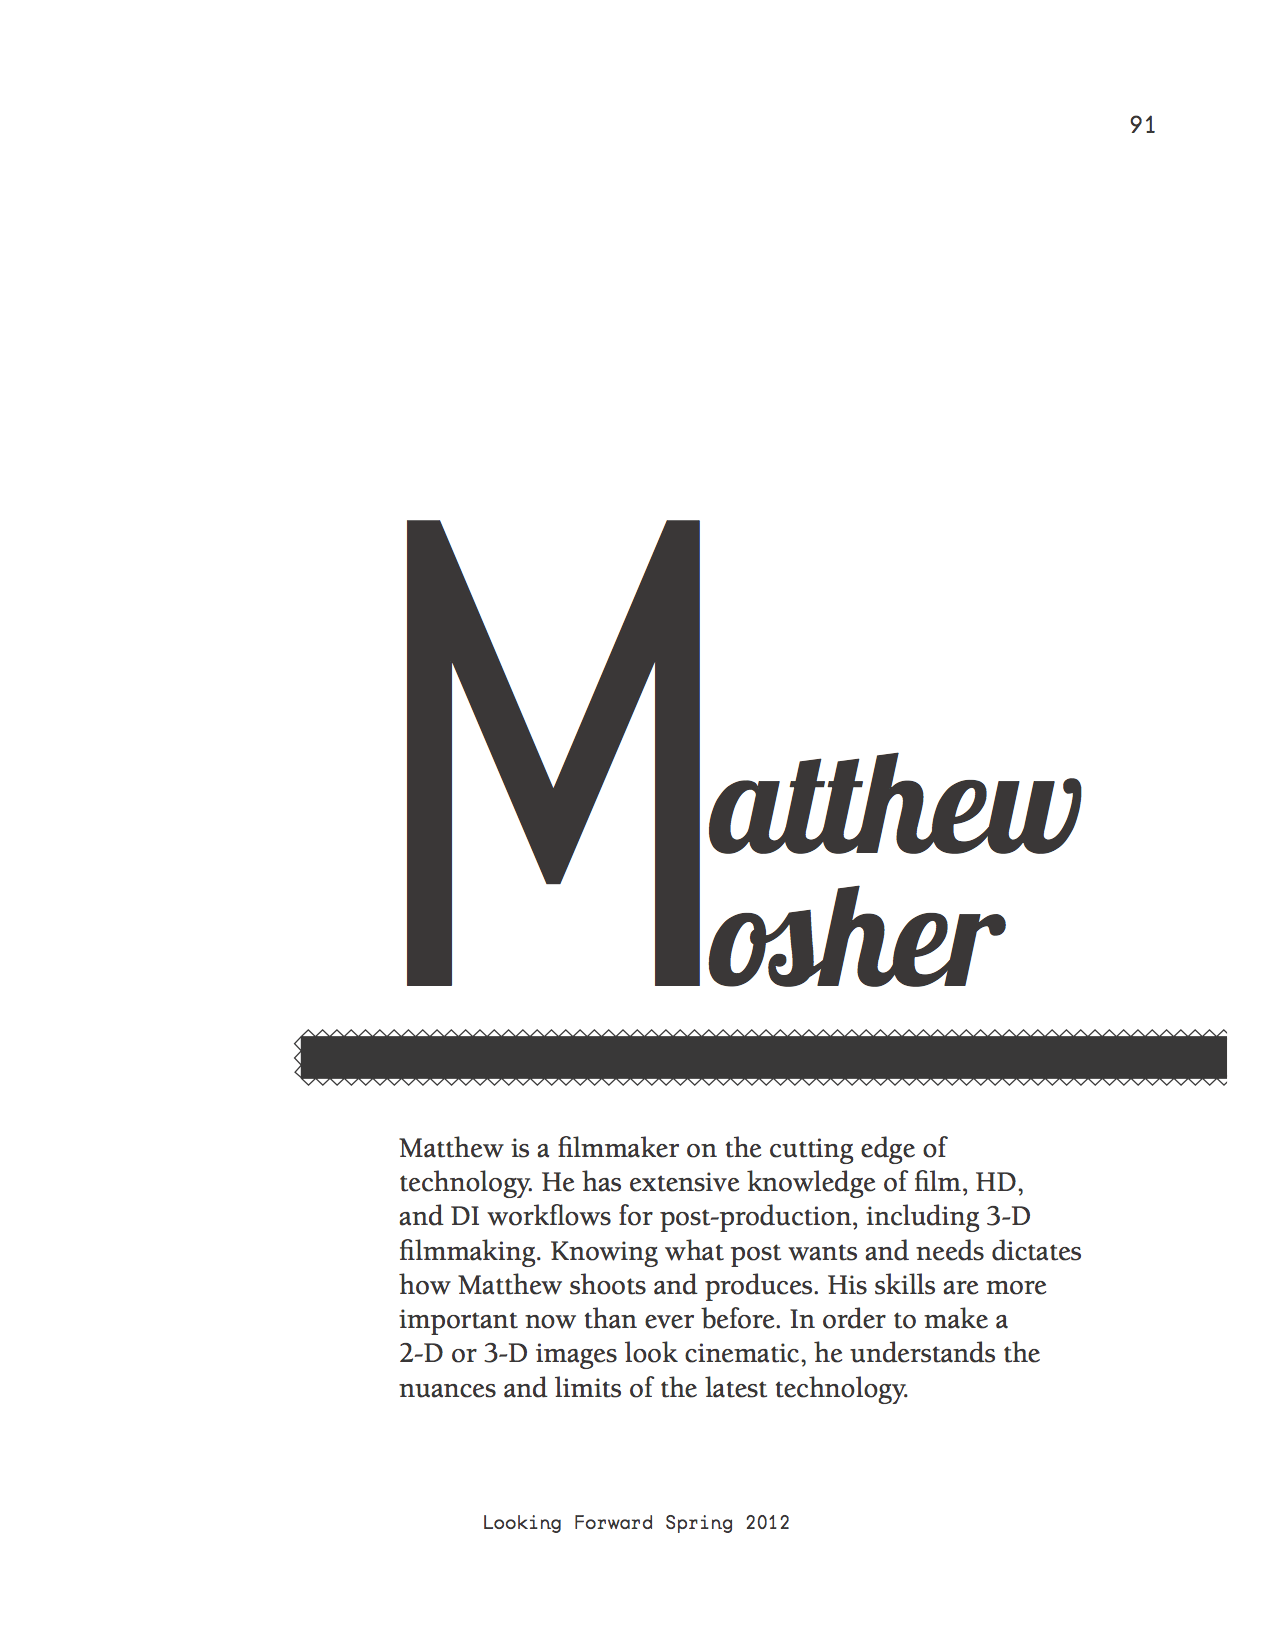 Matthew Mosher LFM Page 3 PNG.png